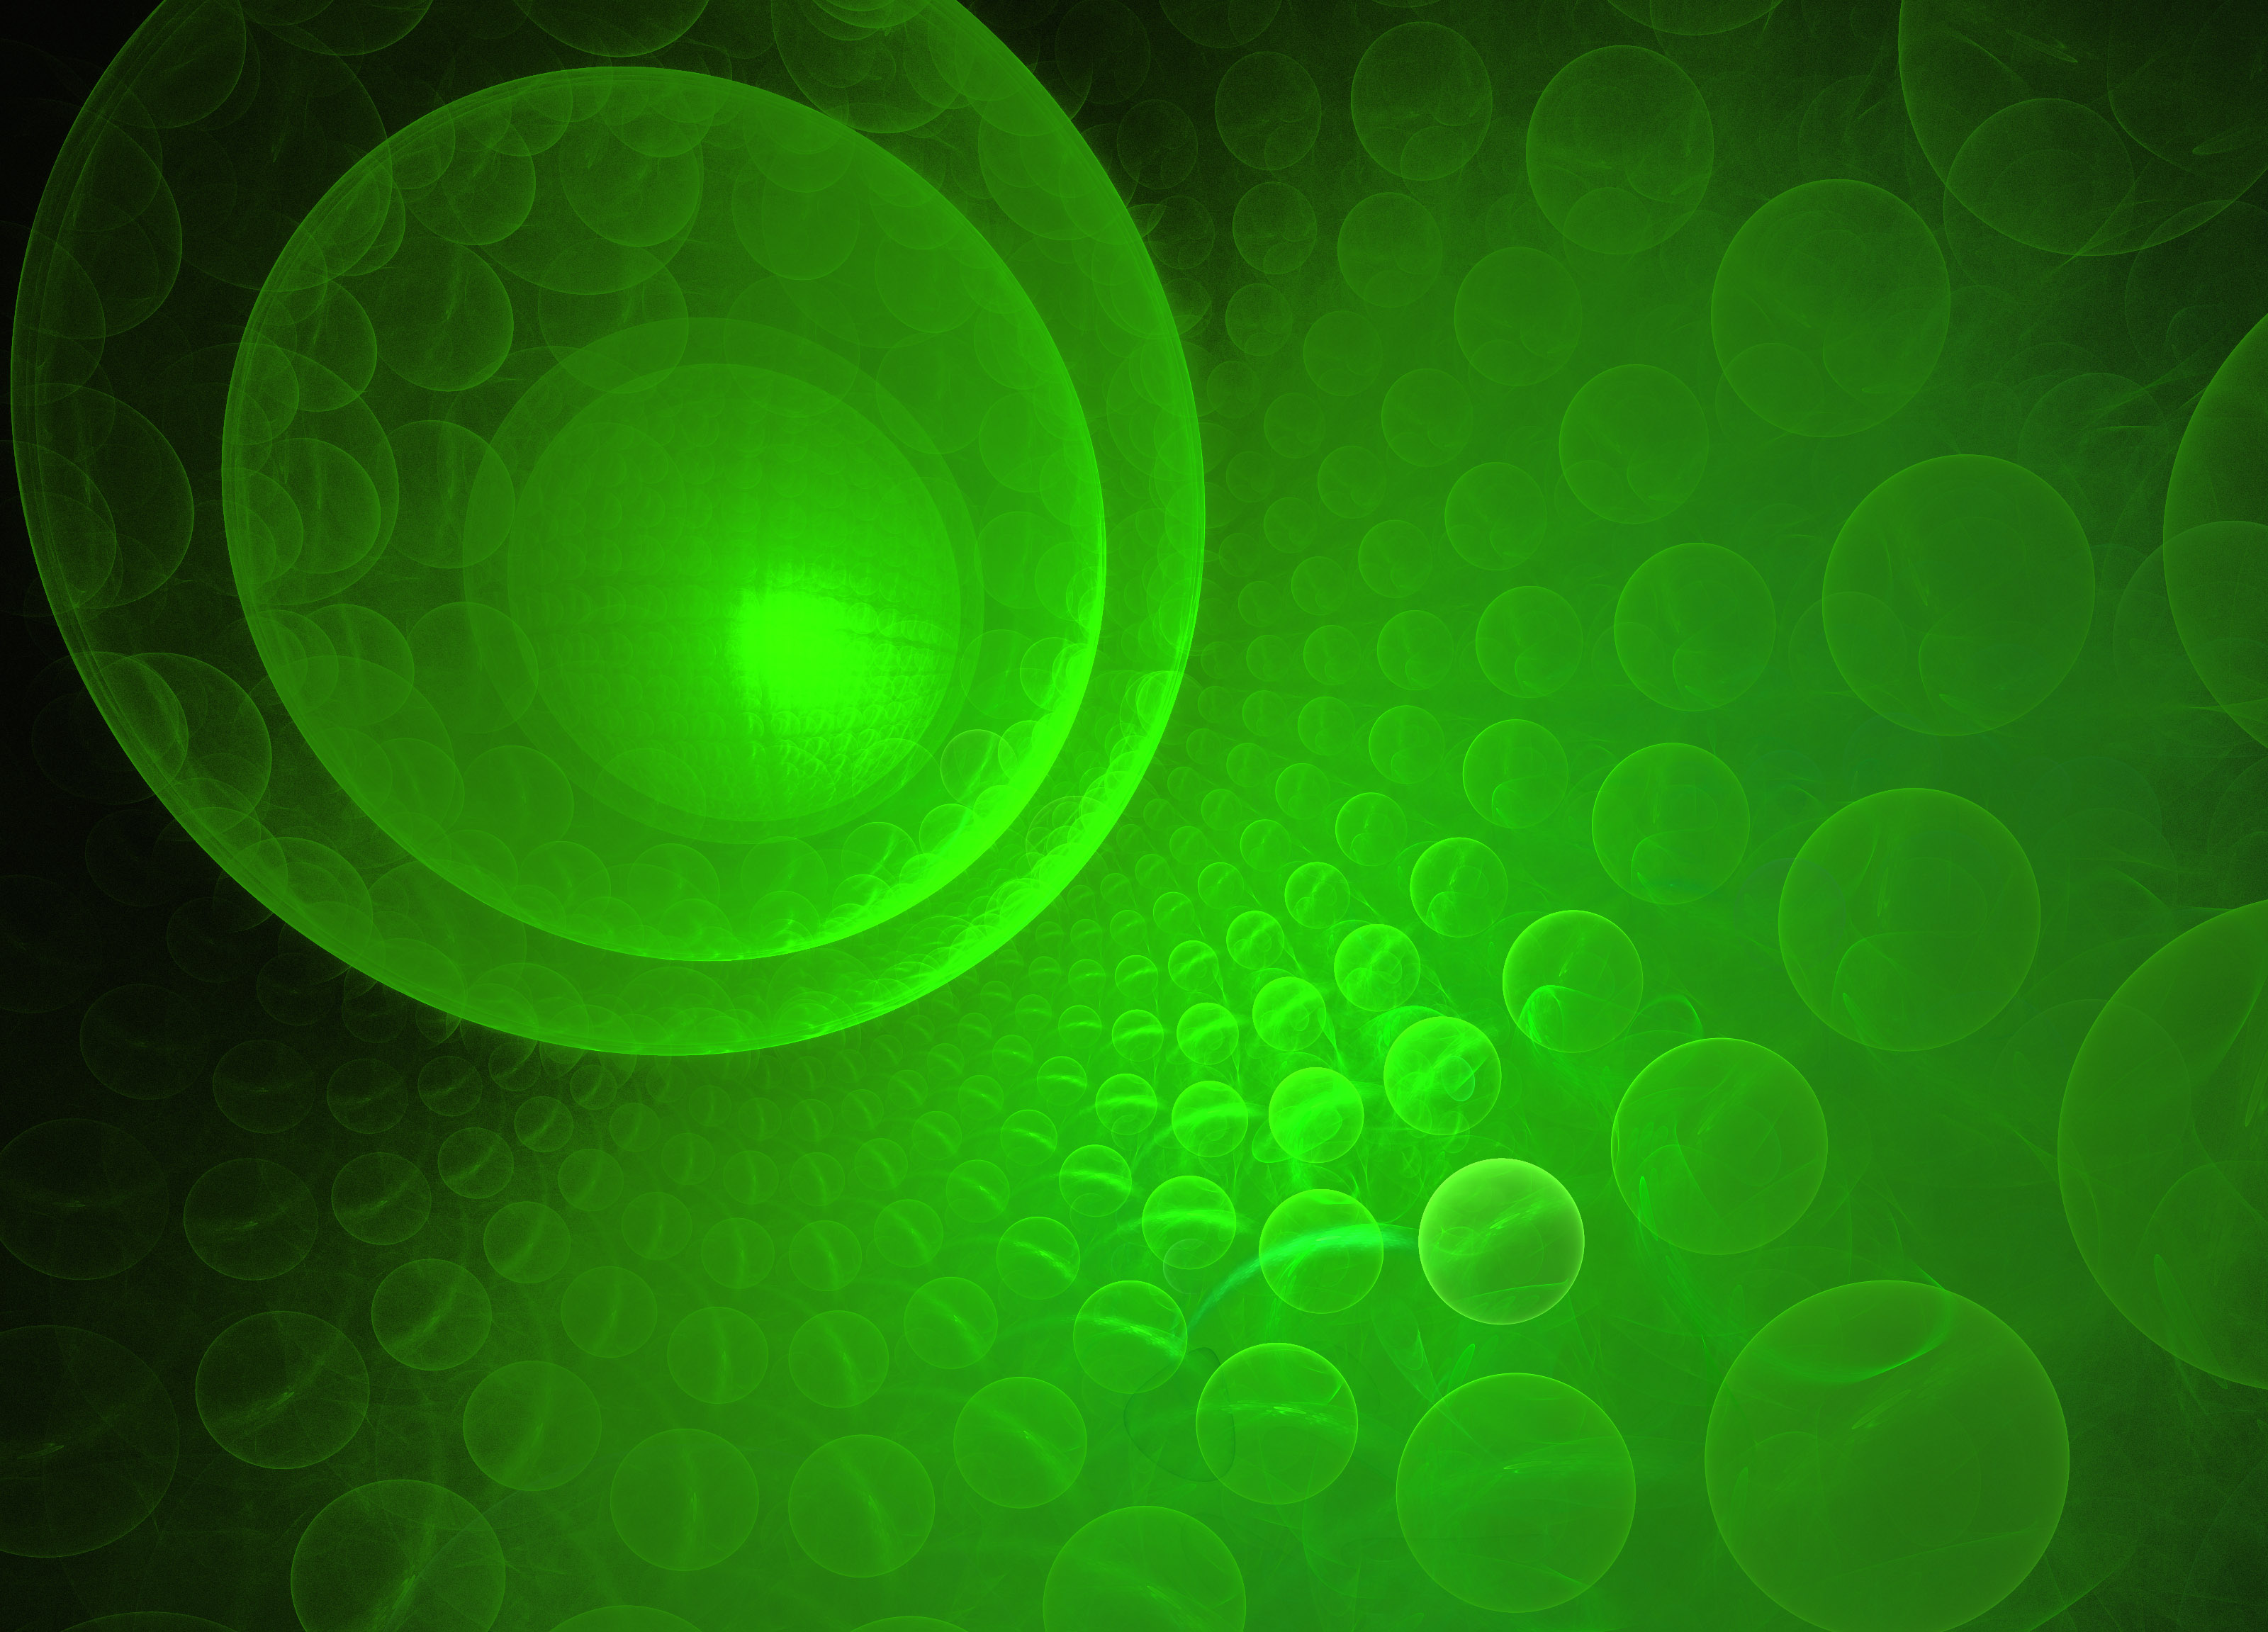 Abstract green wallpaper wallpapersafari - Green abstract background hd ...